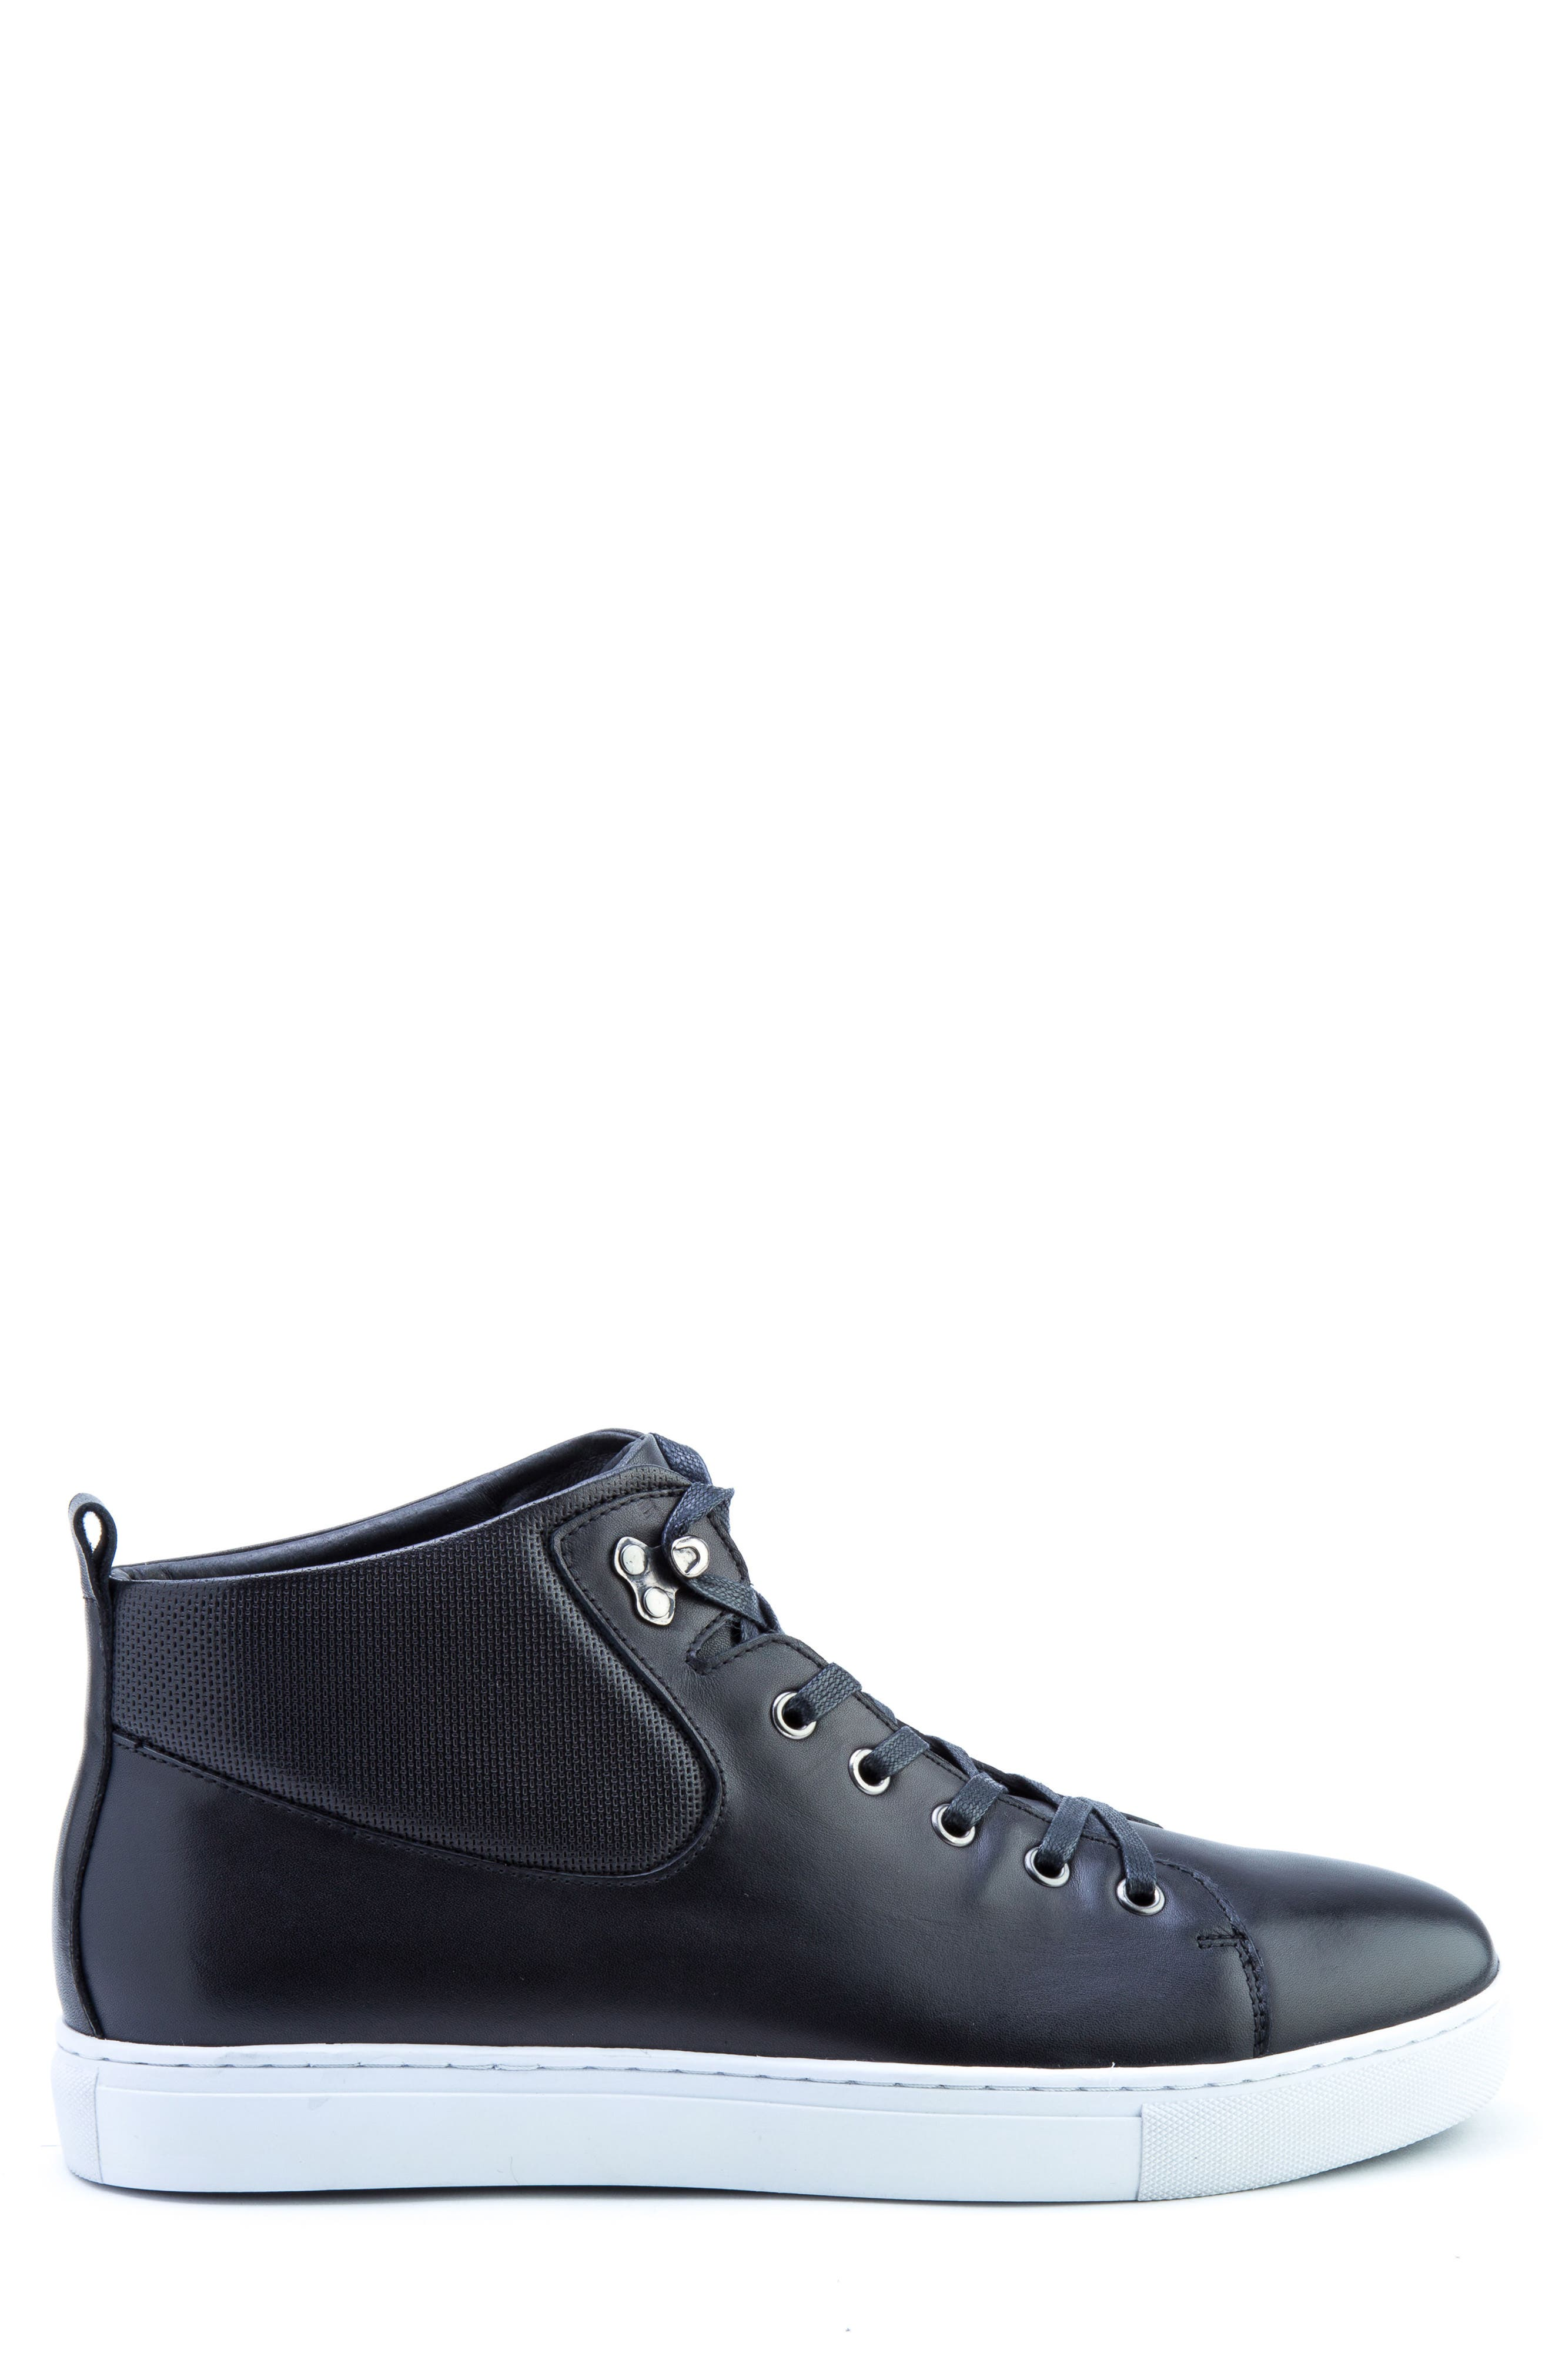 Sanders Sneaker,                             Alternate thumbnail 3, color,                             Black Leather